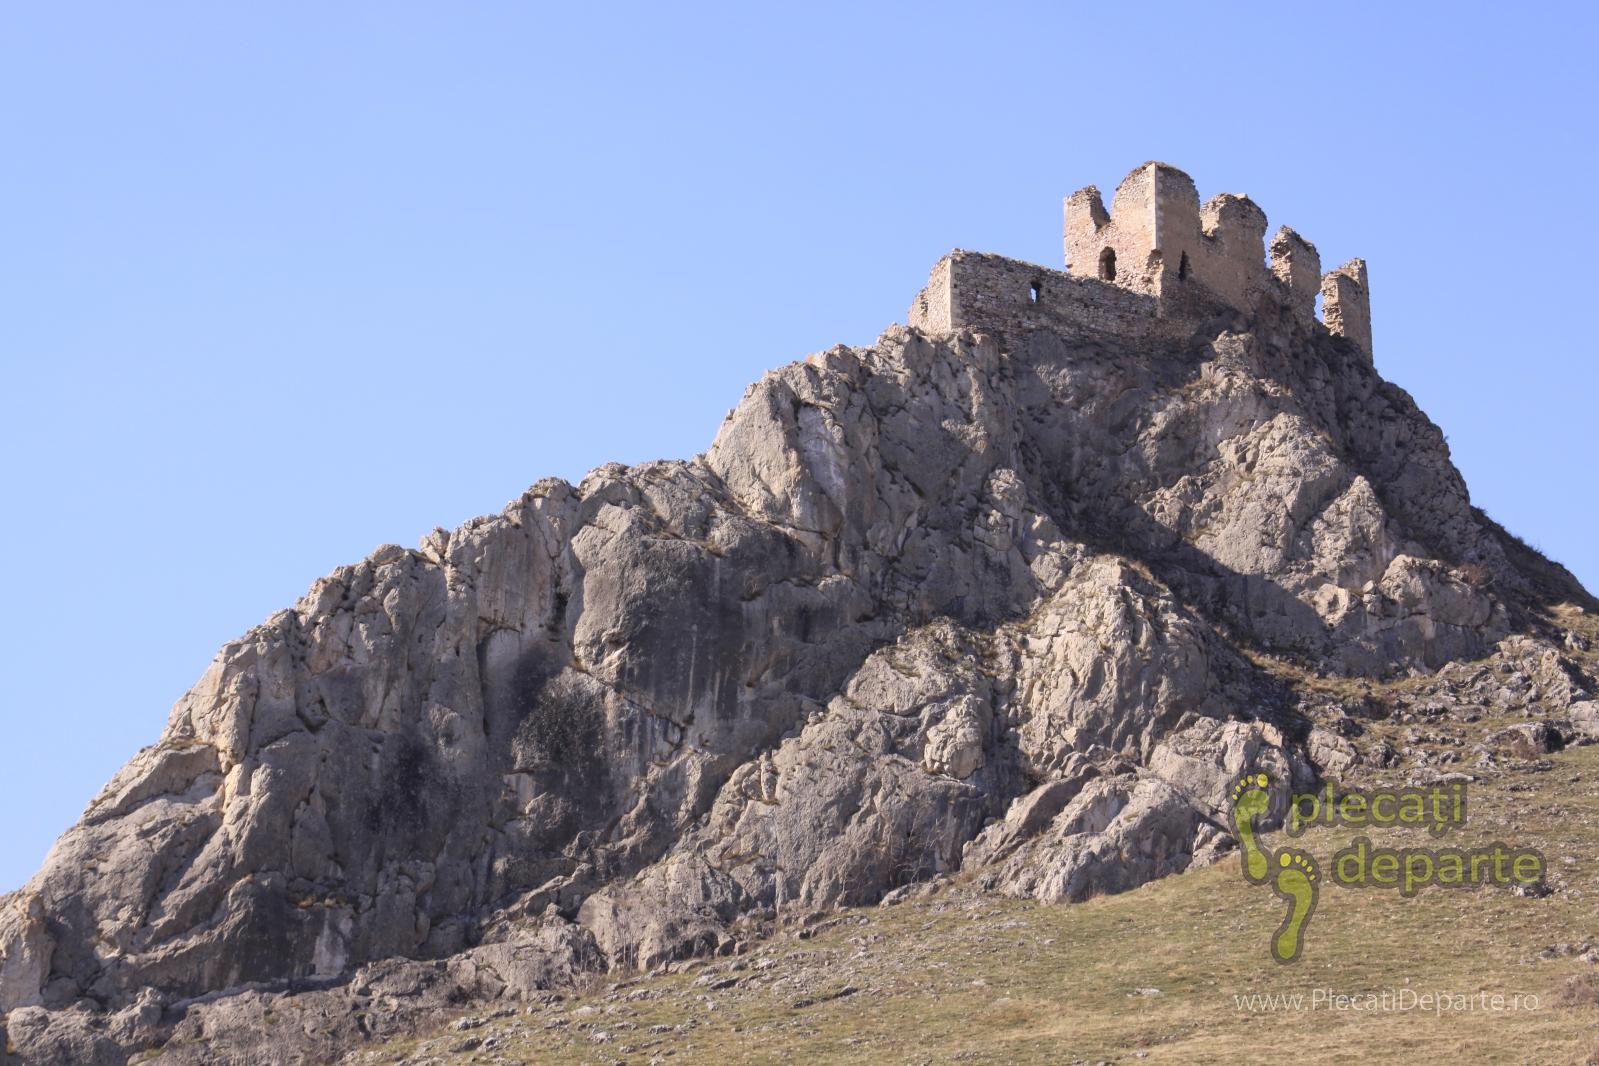 Cetatea de la Coltesti, Muntii trascaului, toamna primavara